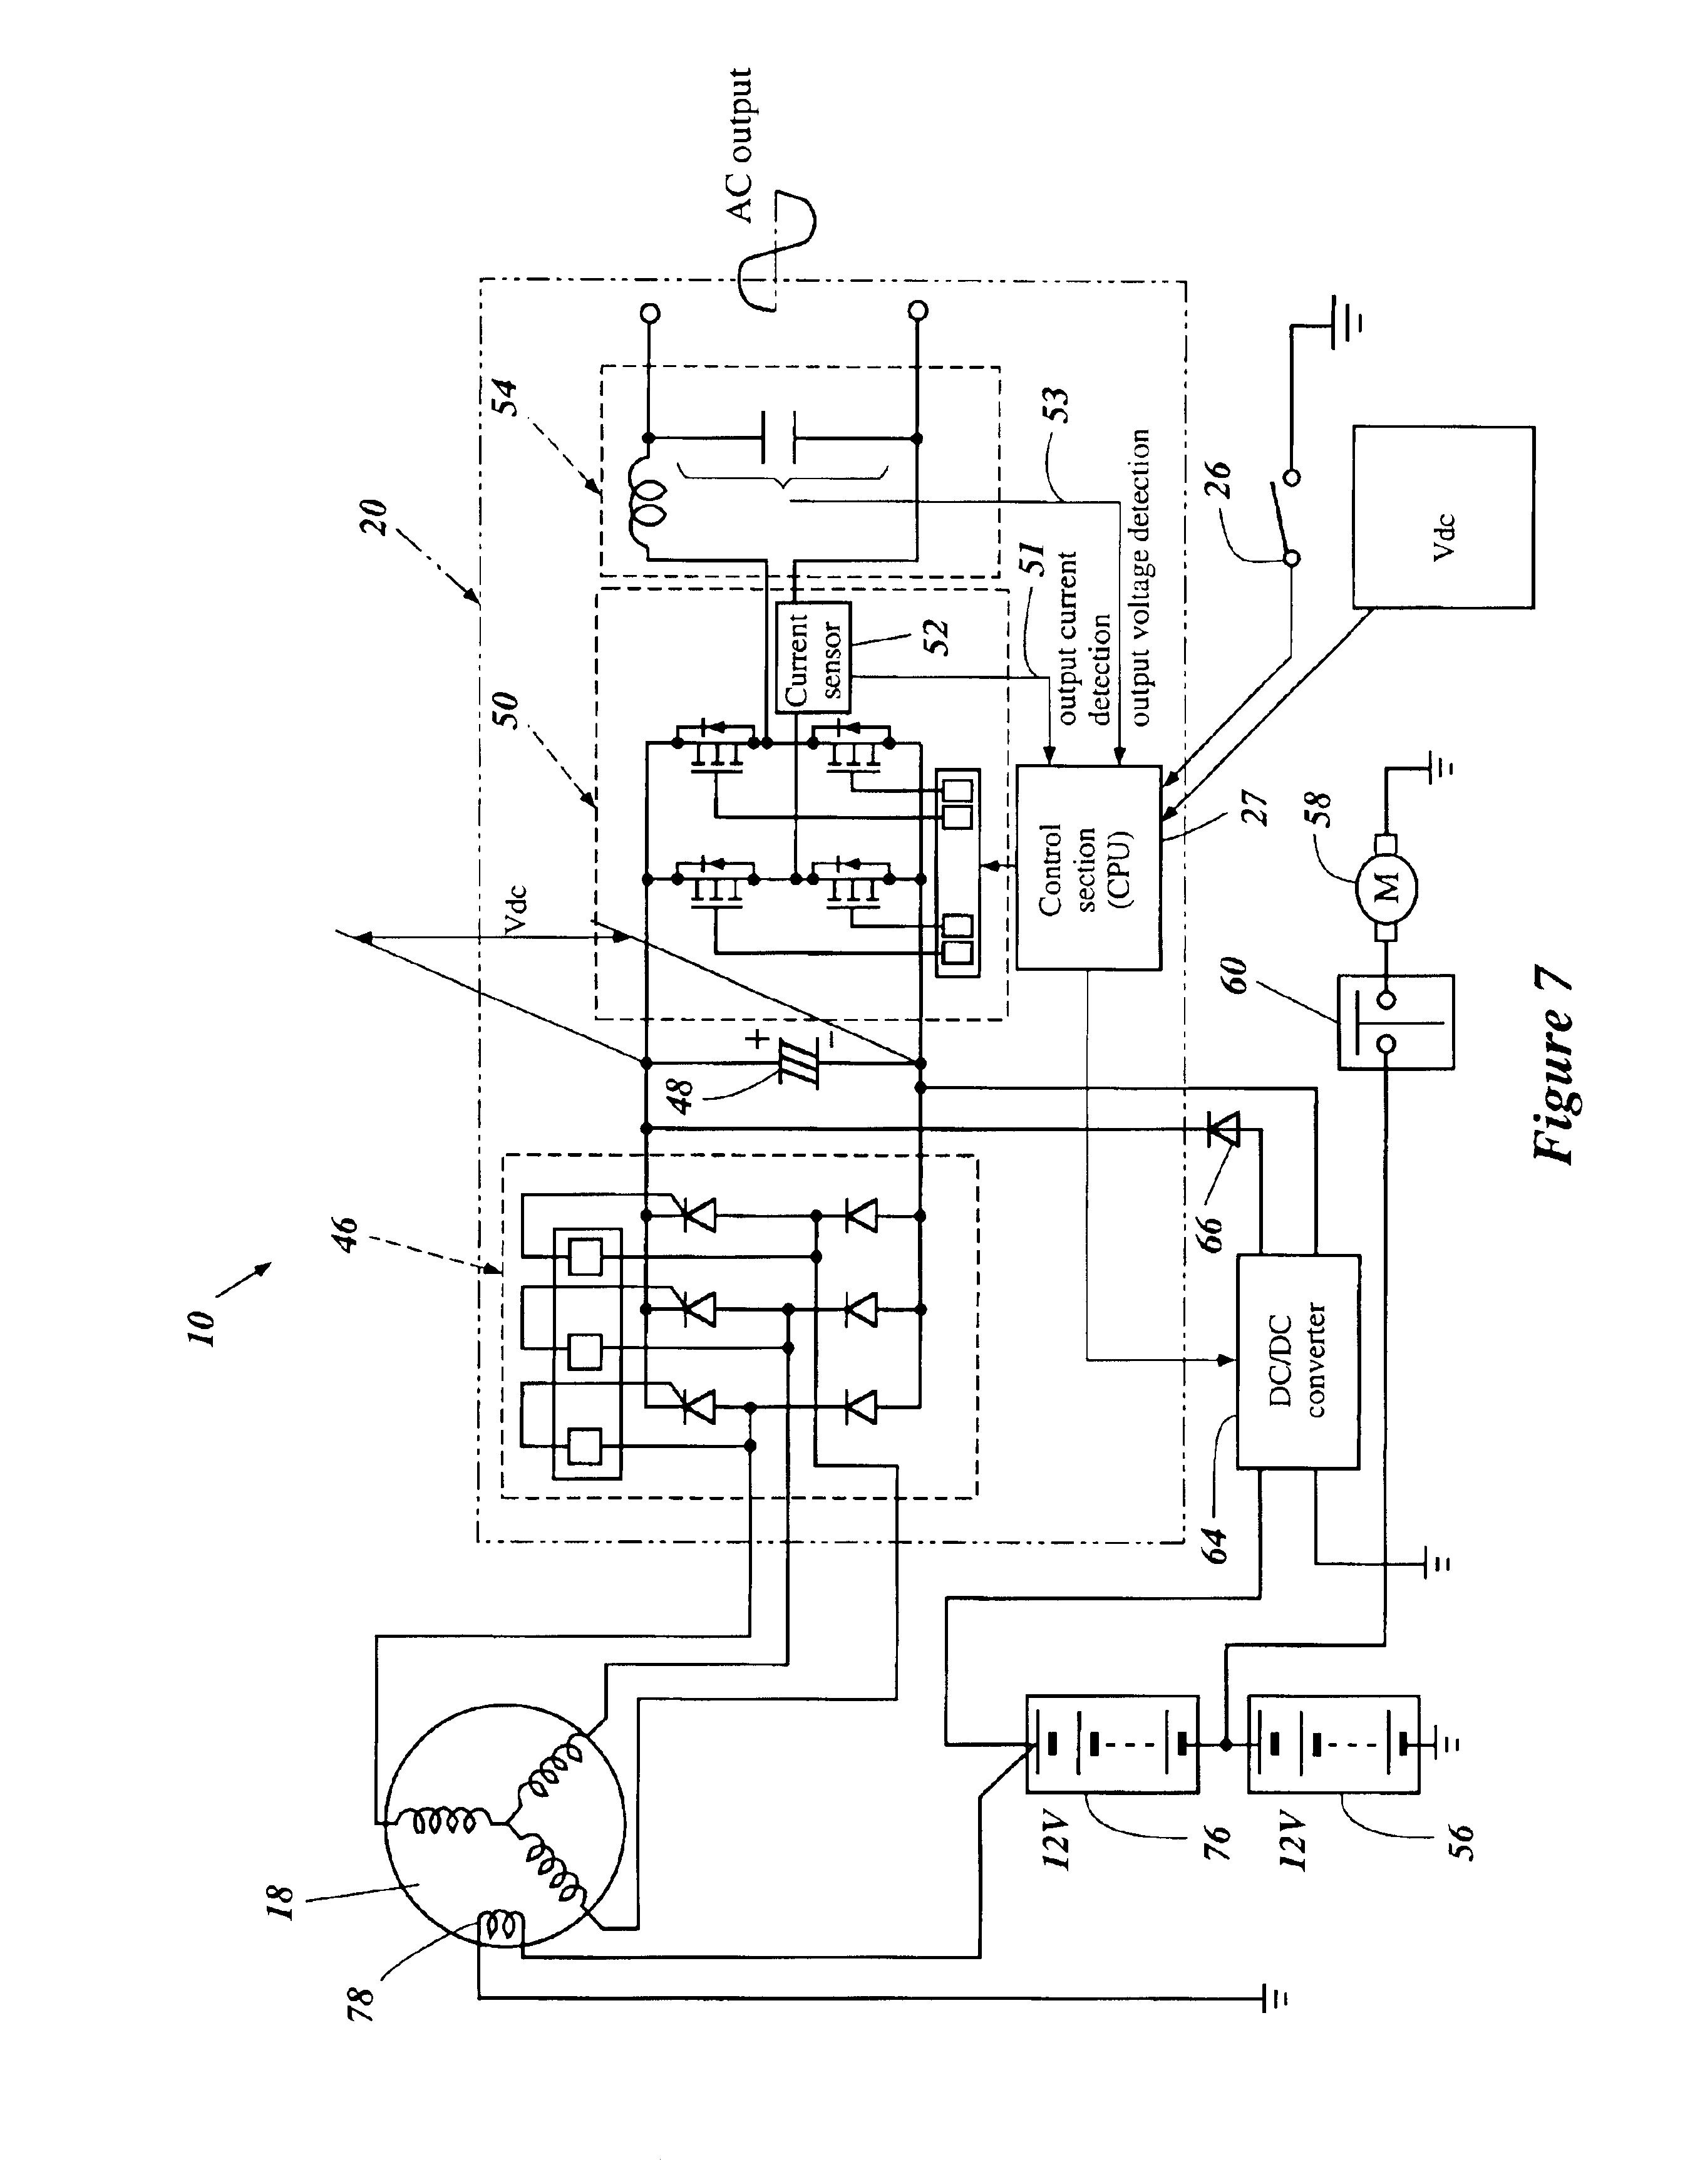 external combustion engine diagram imageresizertool com Usual Internal Combustion Engines Parts Diagram First Combustion Engine Diagram